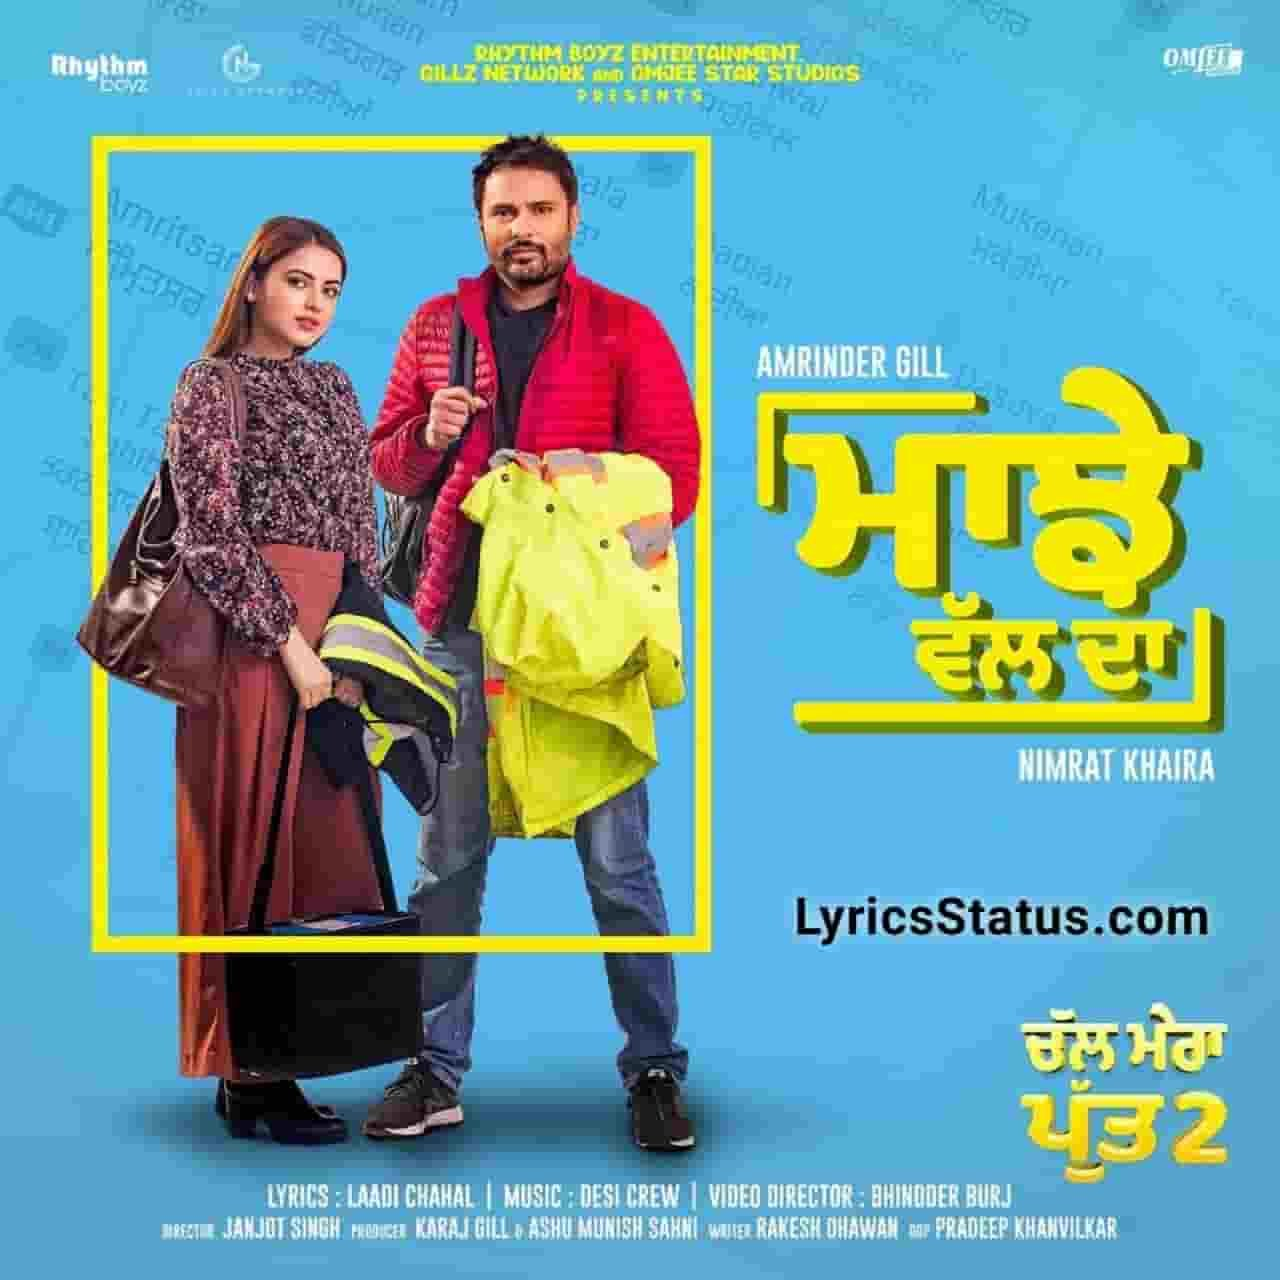 Nimrat Khaira Majhe wal da Amrinder Gill Lyrics status download Punjabi Song Gabru Ae Majhe Wal Da Jatti Ludhiane Wal Di black background video